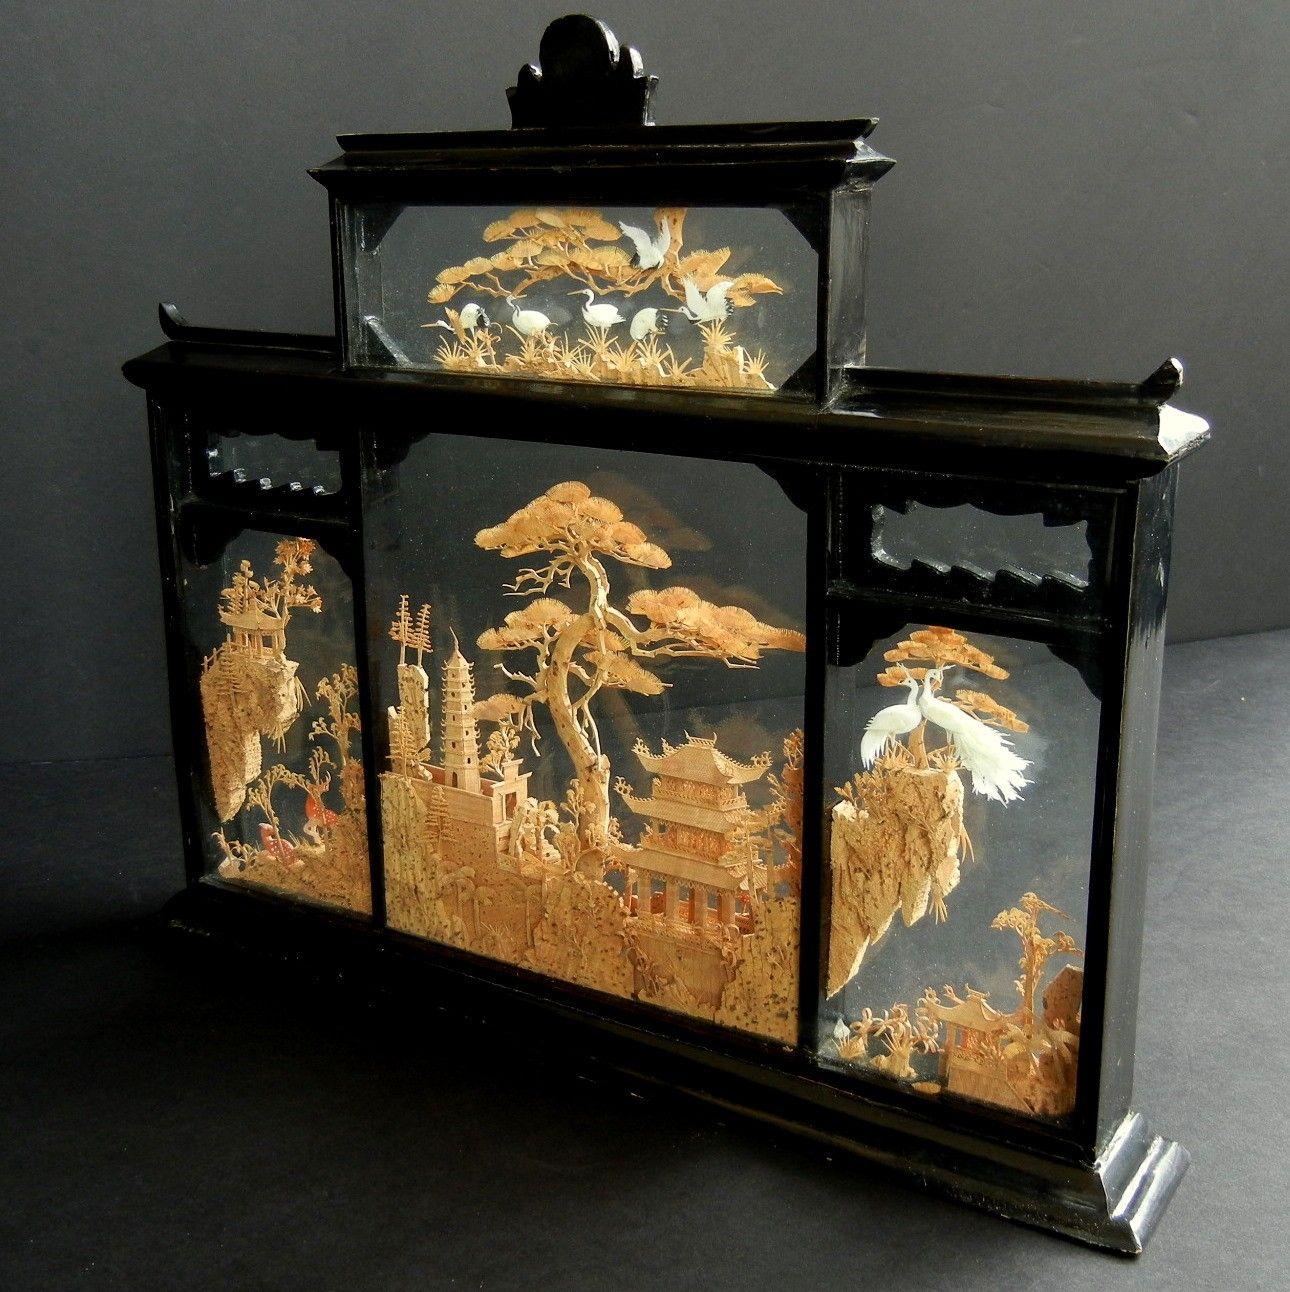 Il Fullxfull 230406984 Jpg Obrazek Jpeg 1290 1292 Pikseli Skala 50 European Art Chinese Antiques